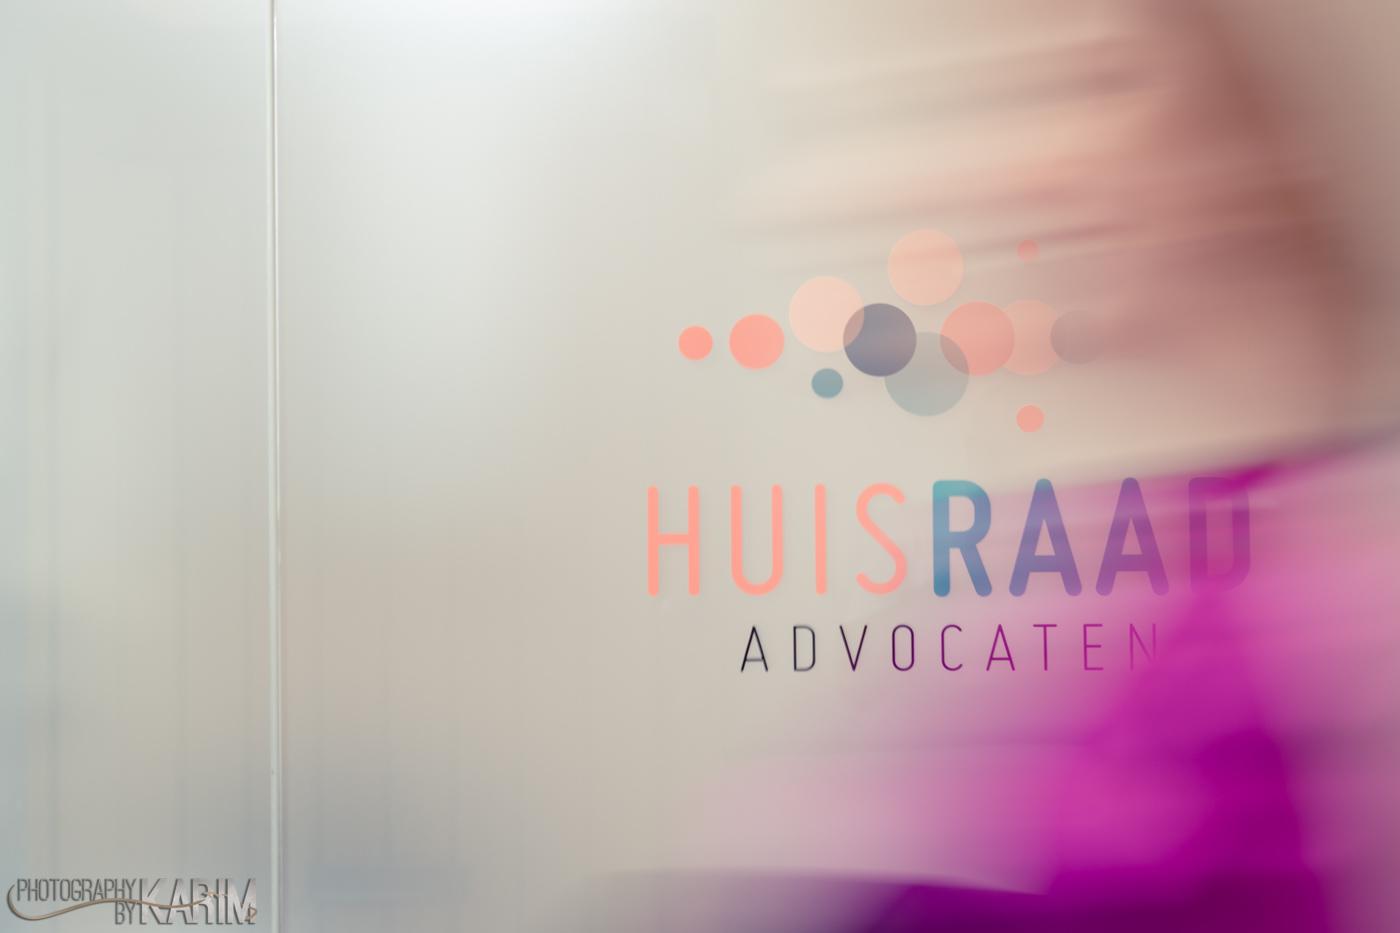 Huisraad Advocaten 2017 shoot